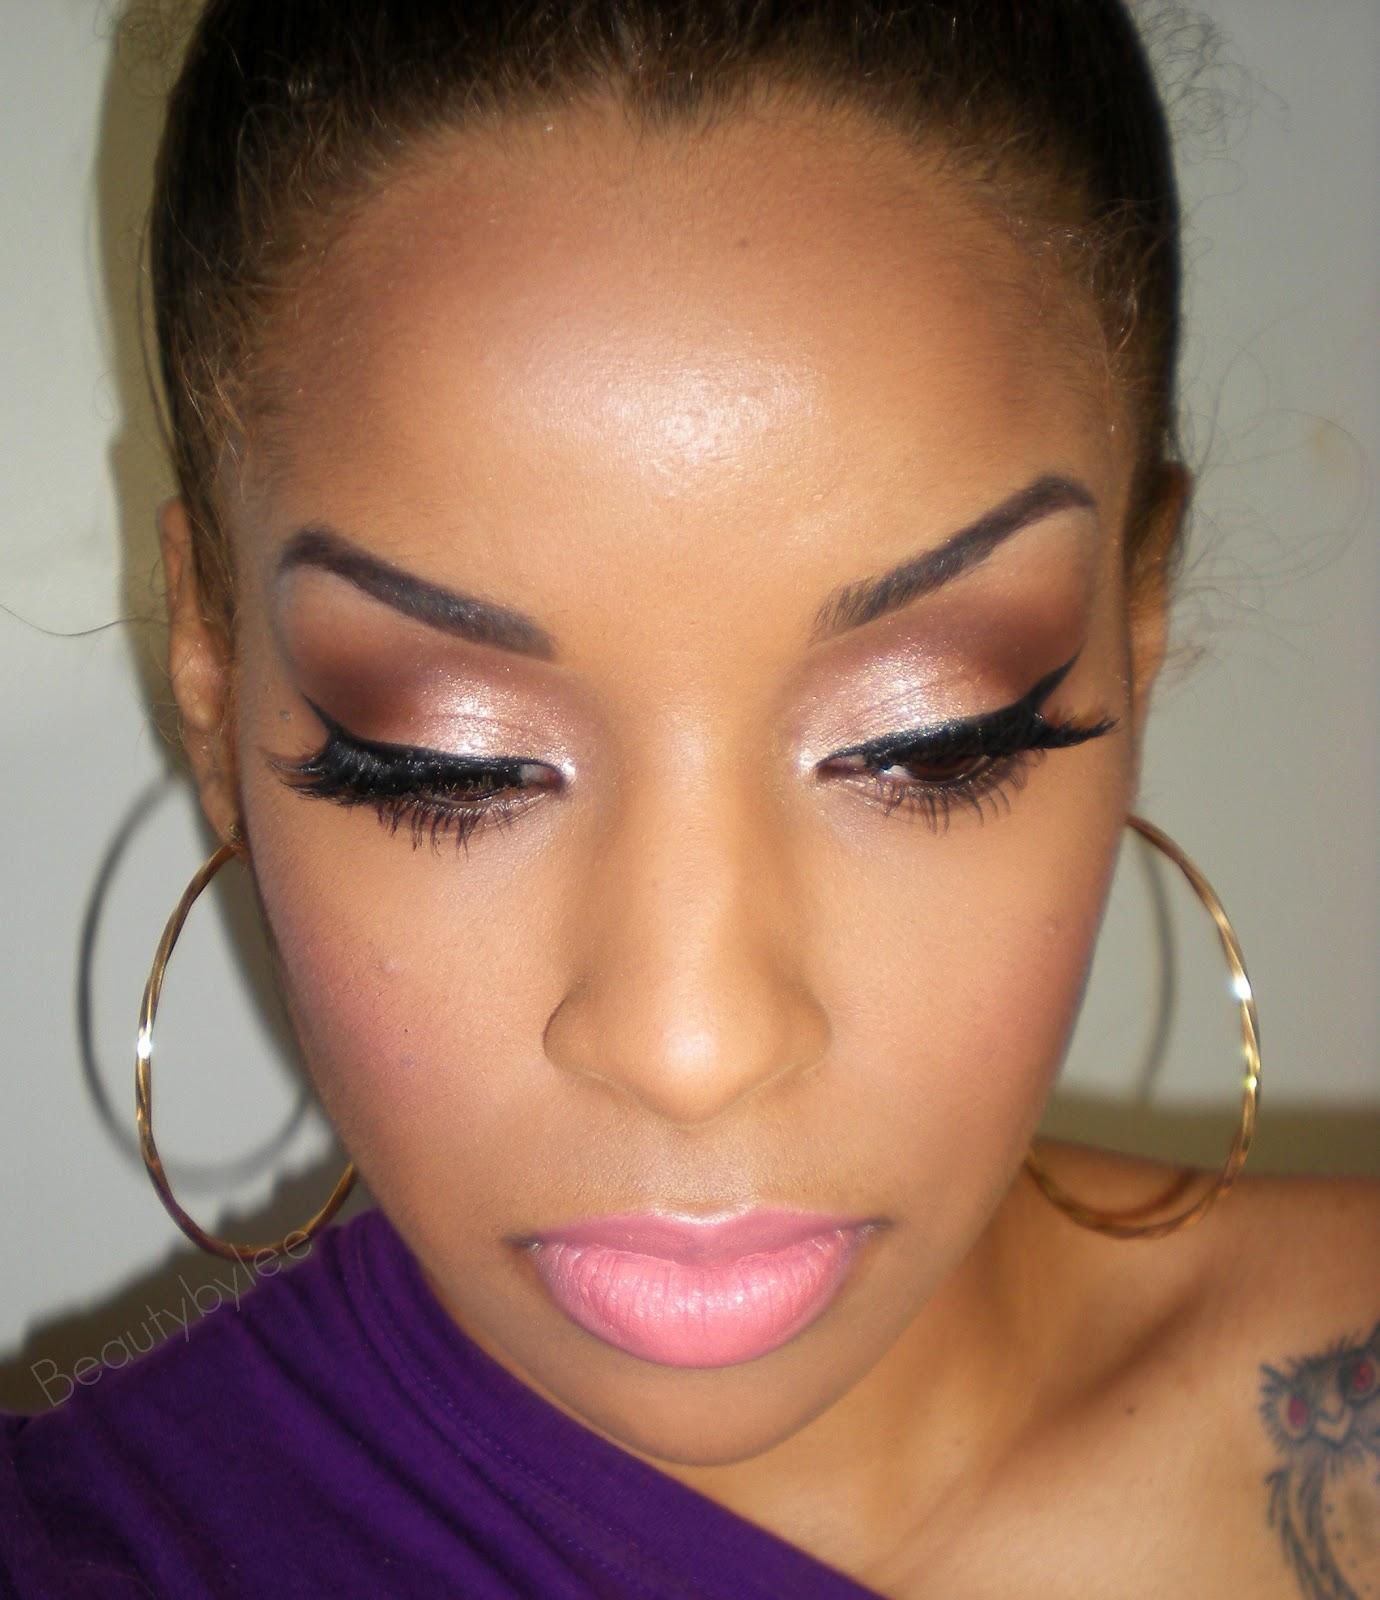 Eye Makeup clinique rinse off eye makeup remover : L Oreal Makeup Tutorials - Makeup Vidalondon